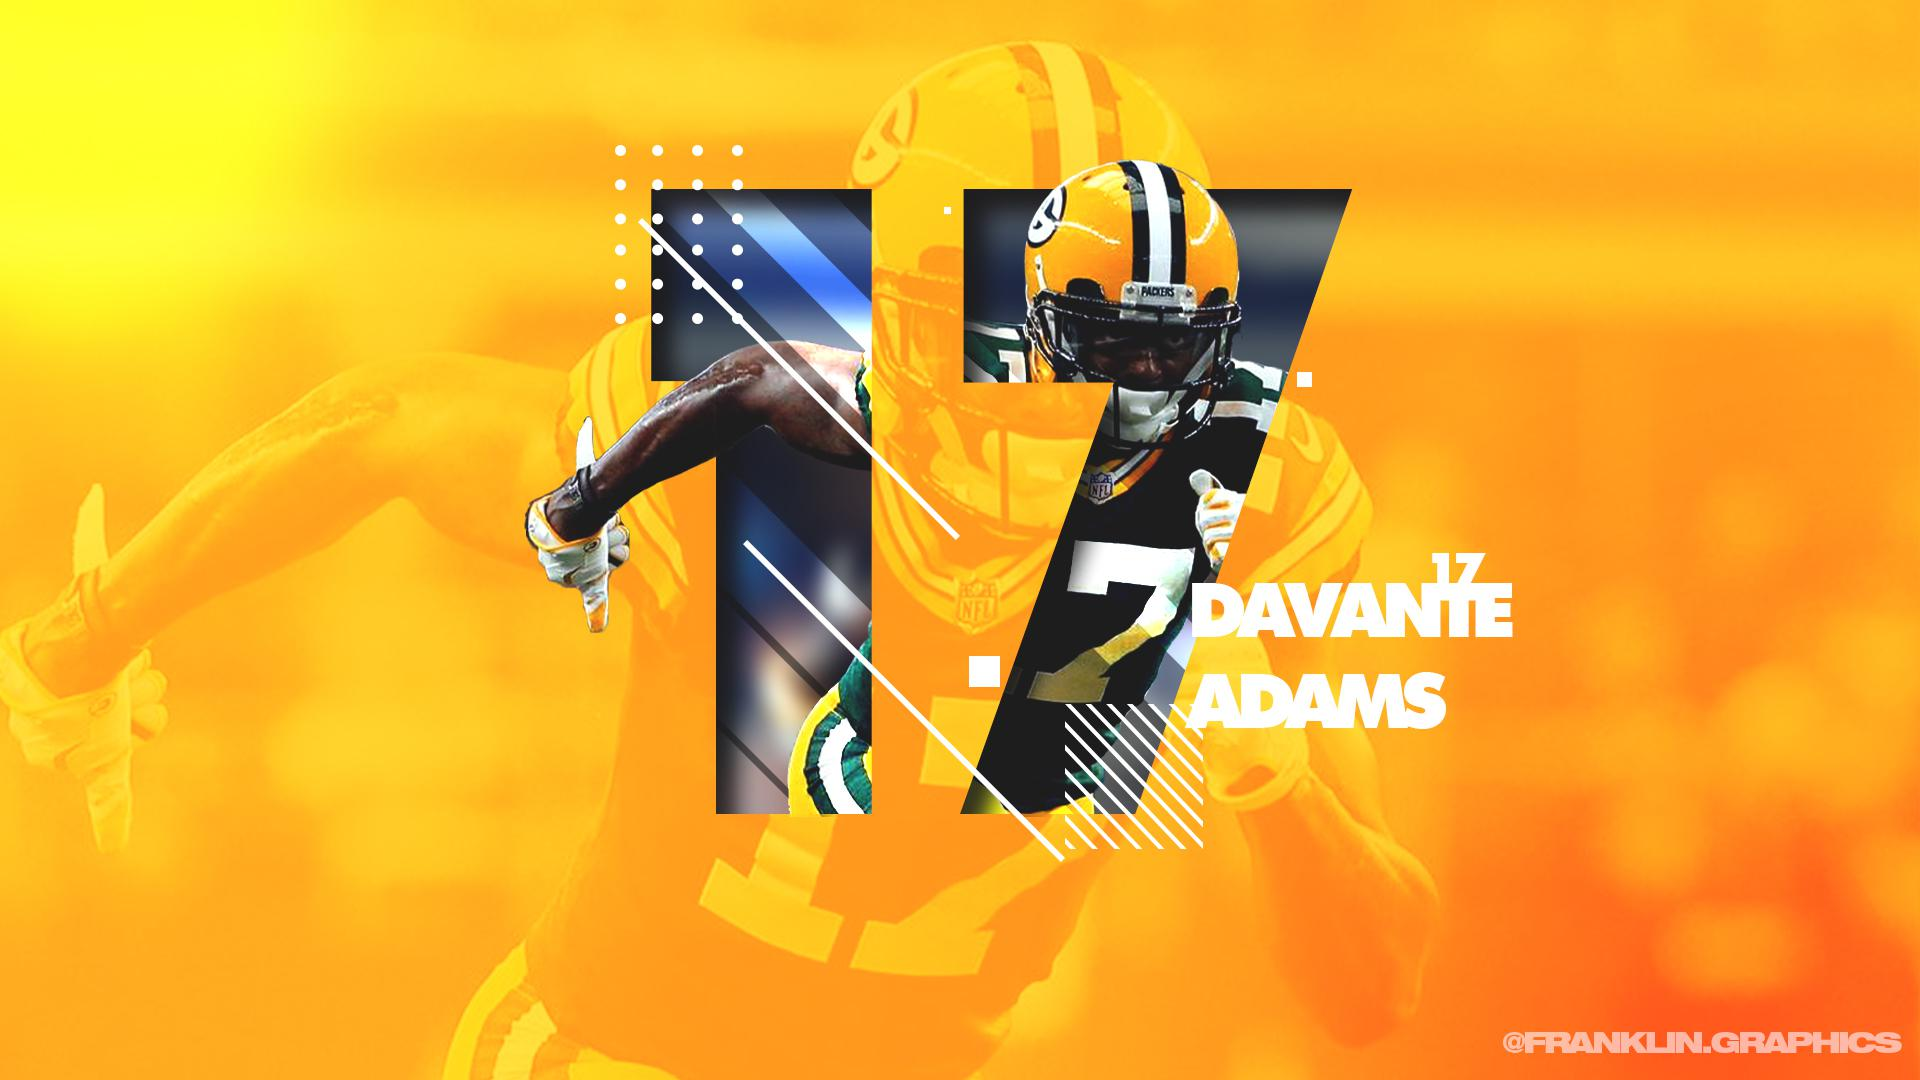 Davante Adams Wallpapers Top Free Davante Adams Backgrounds Wallpaperaccess